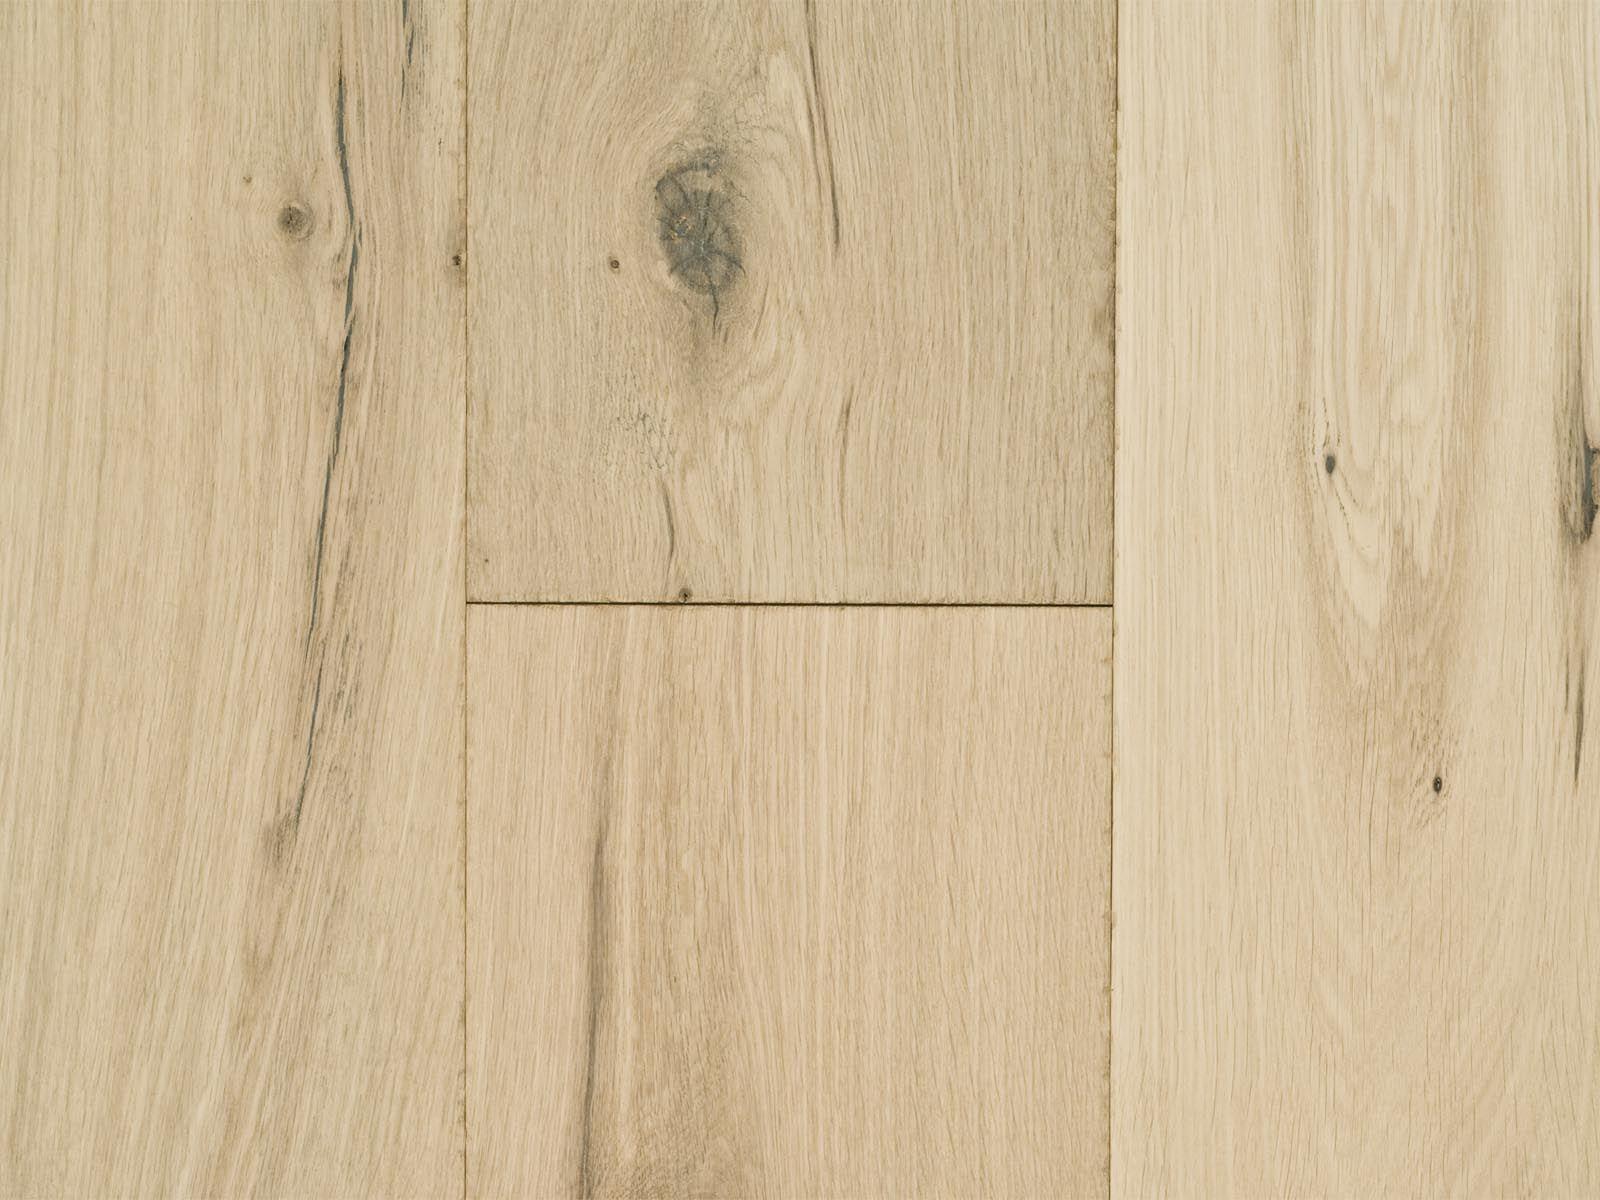 ChateauWhite Oiled Best laminate, Flooring, Oak